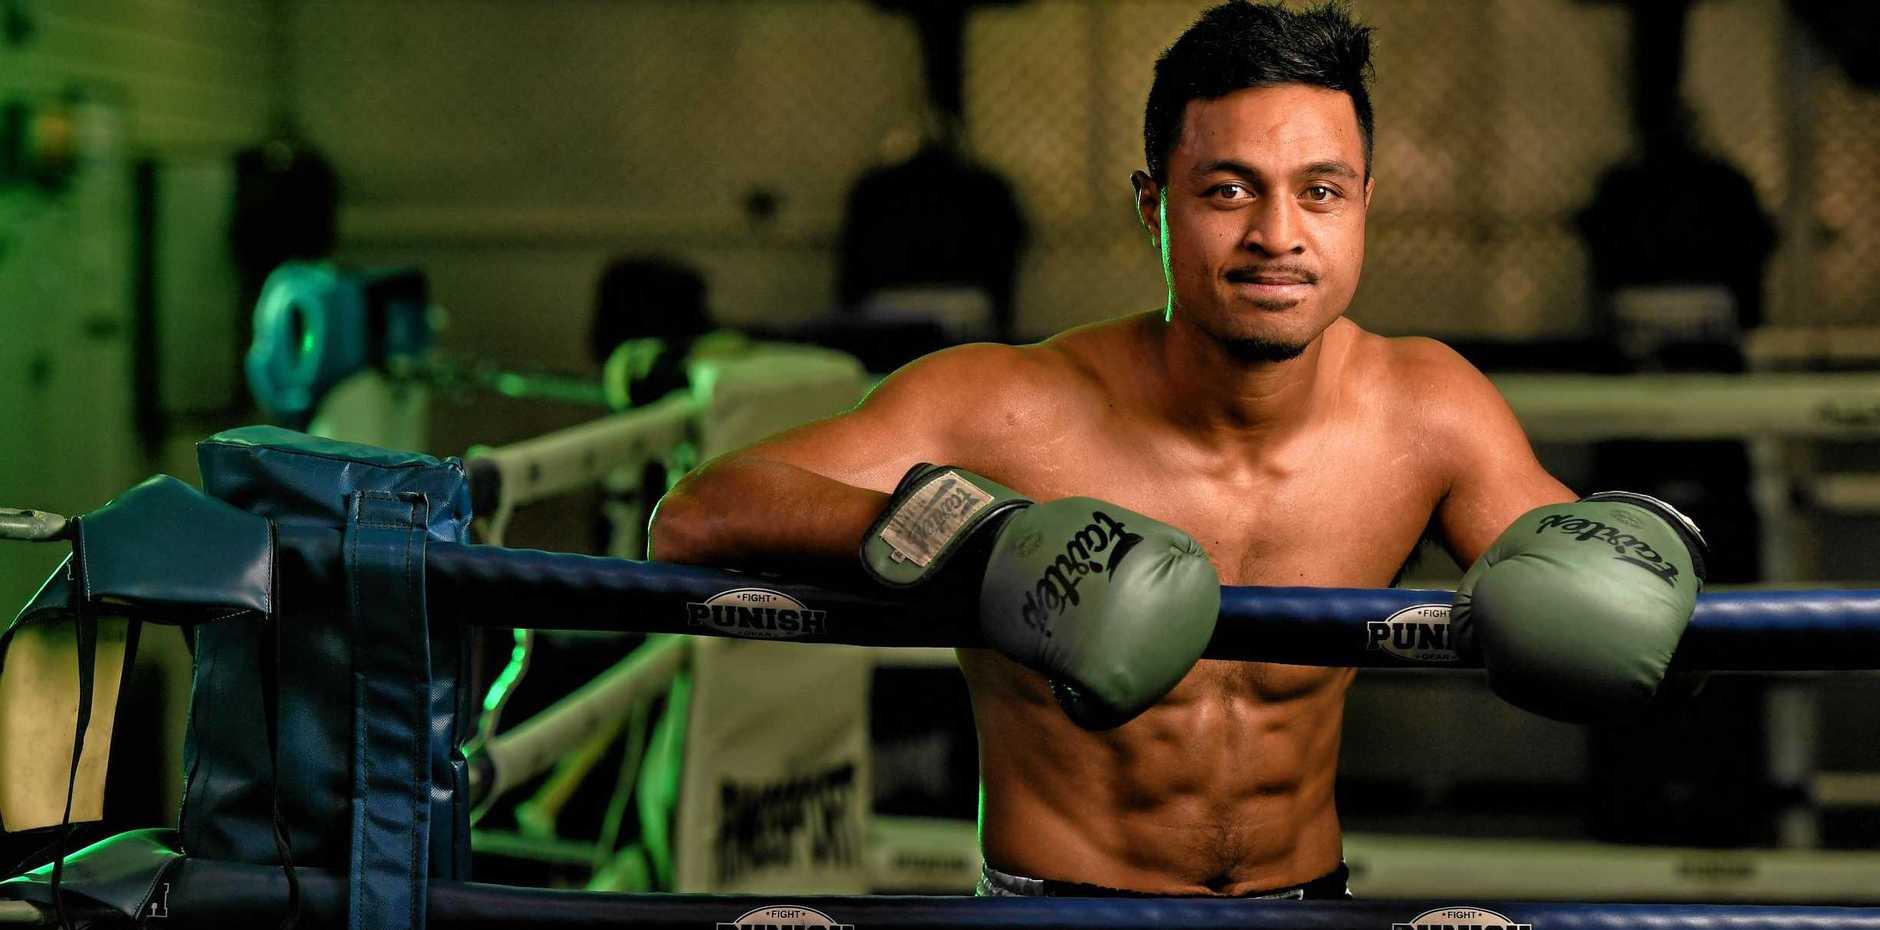 STANDING TALL: Muay Thai fighter Jonathan Aiulu, at Corporate Box gym in Bundamba, reflects on his big bout.